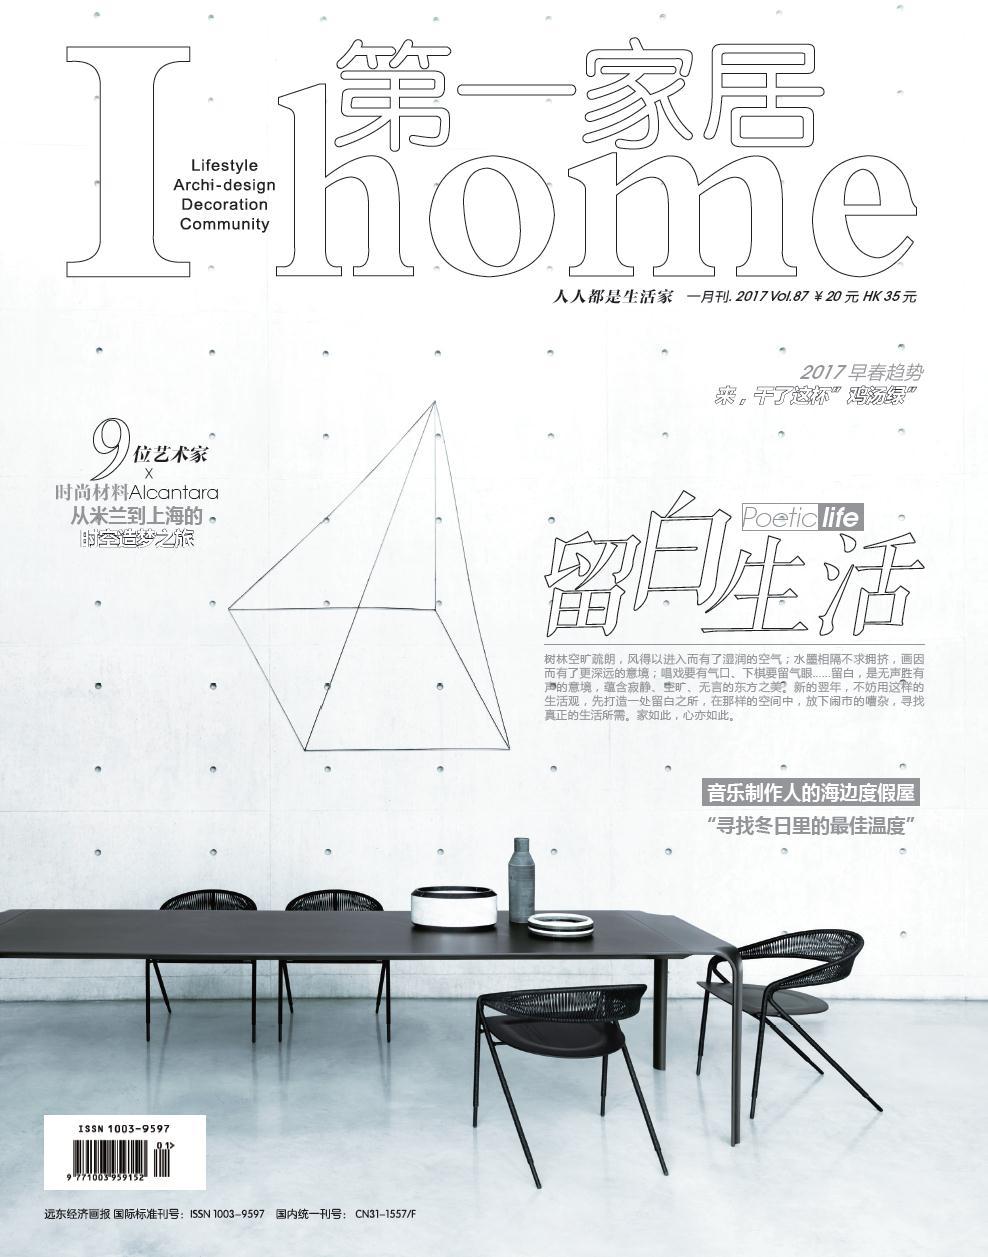 Ihome 2017.jpg